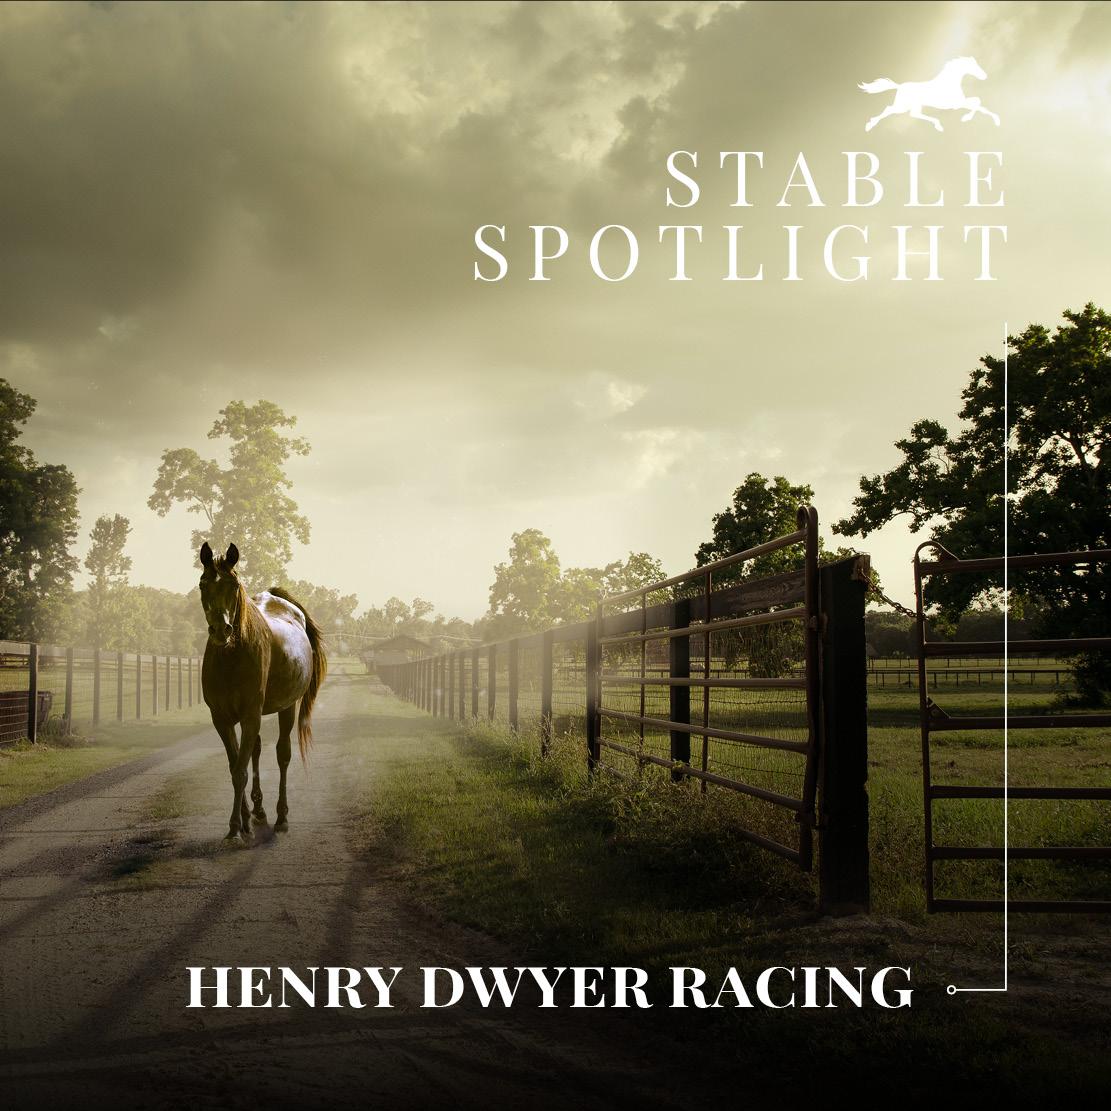 Stable Spotlight – Henry Dwyer Racing